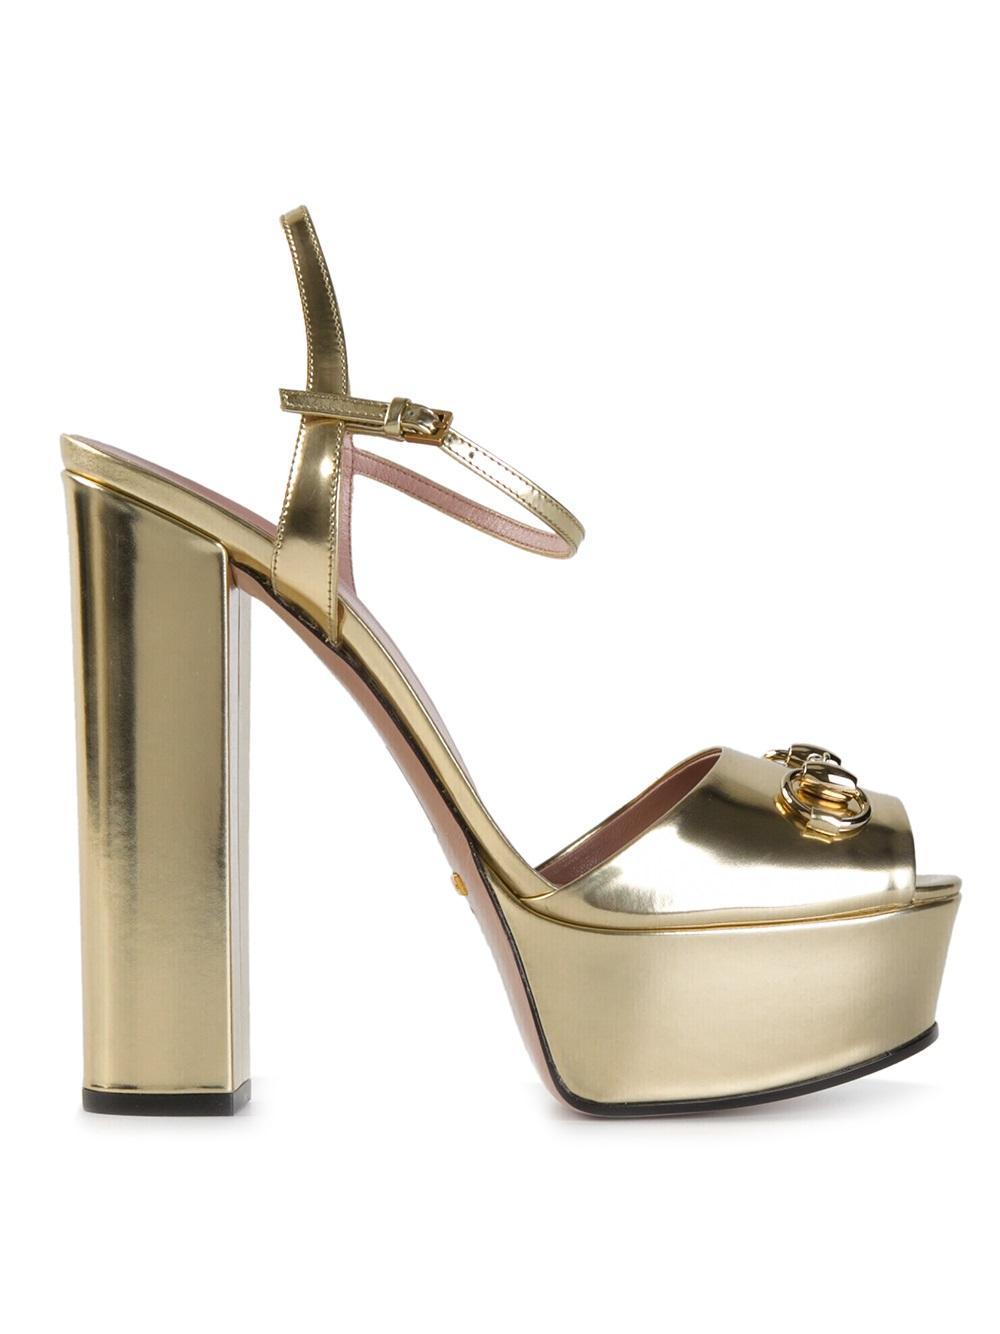 bbeb5dc1f0a2 Lyst - Gucci Chunky Heel Sandals in Metallic